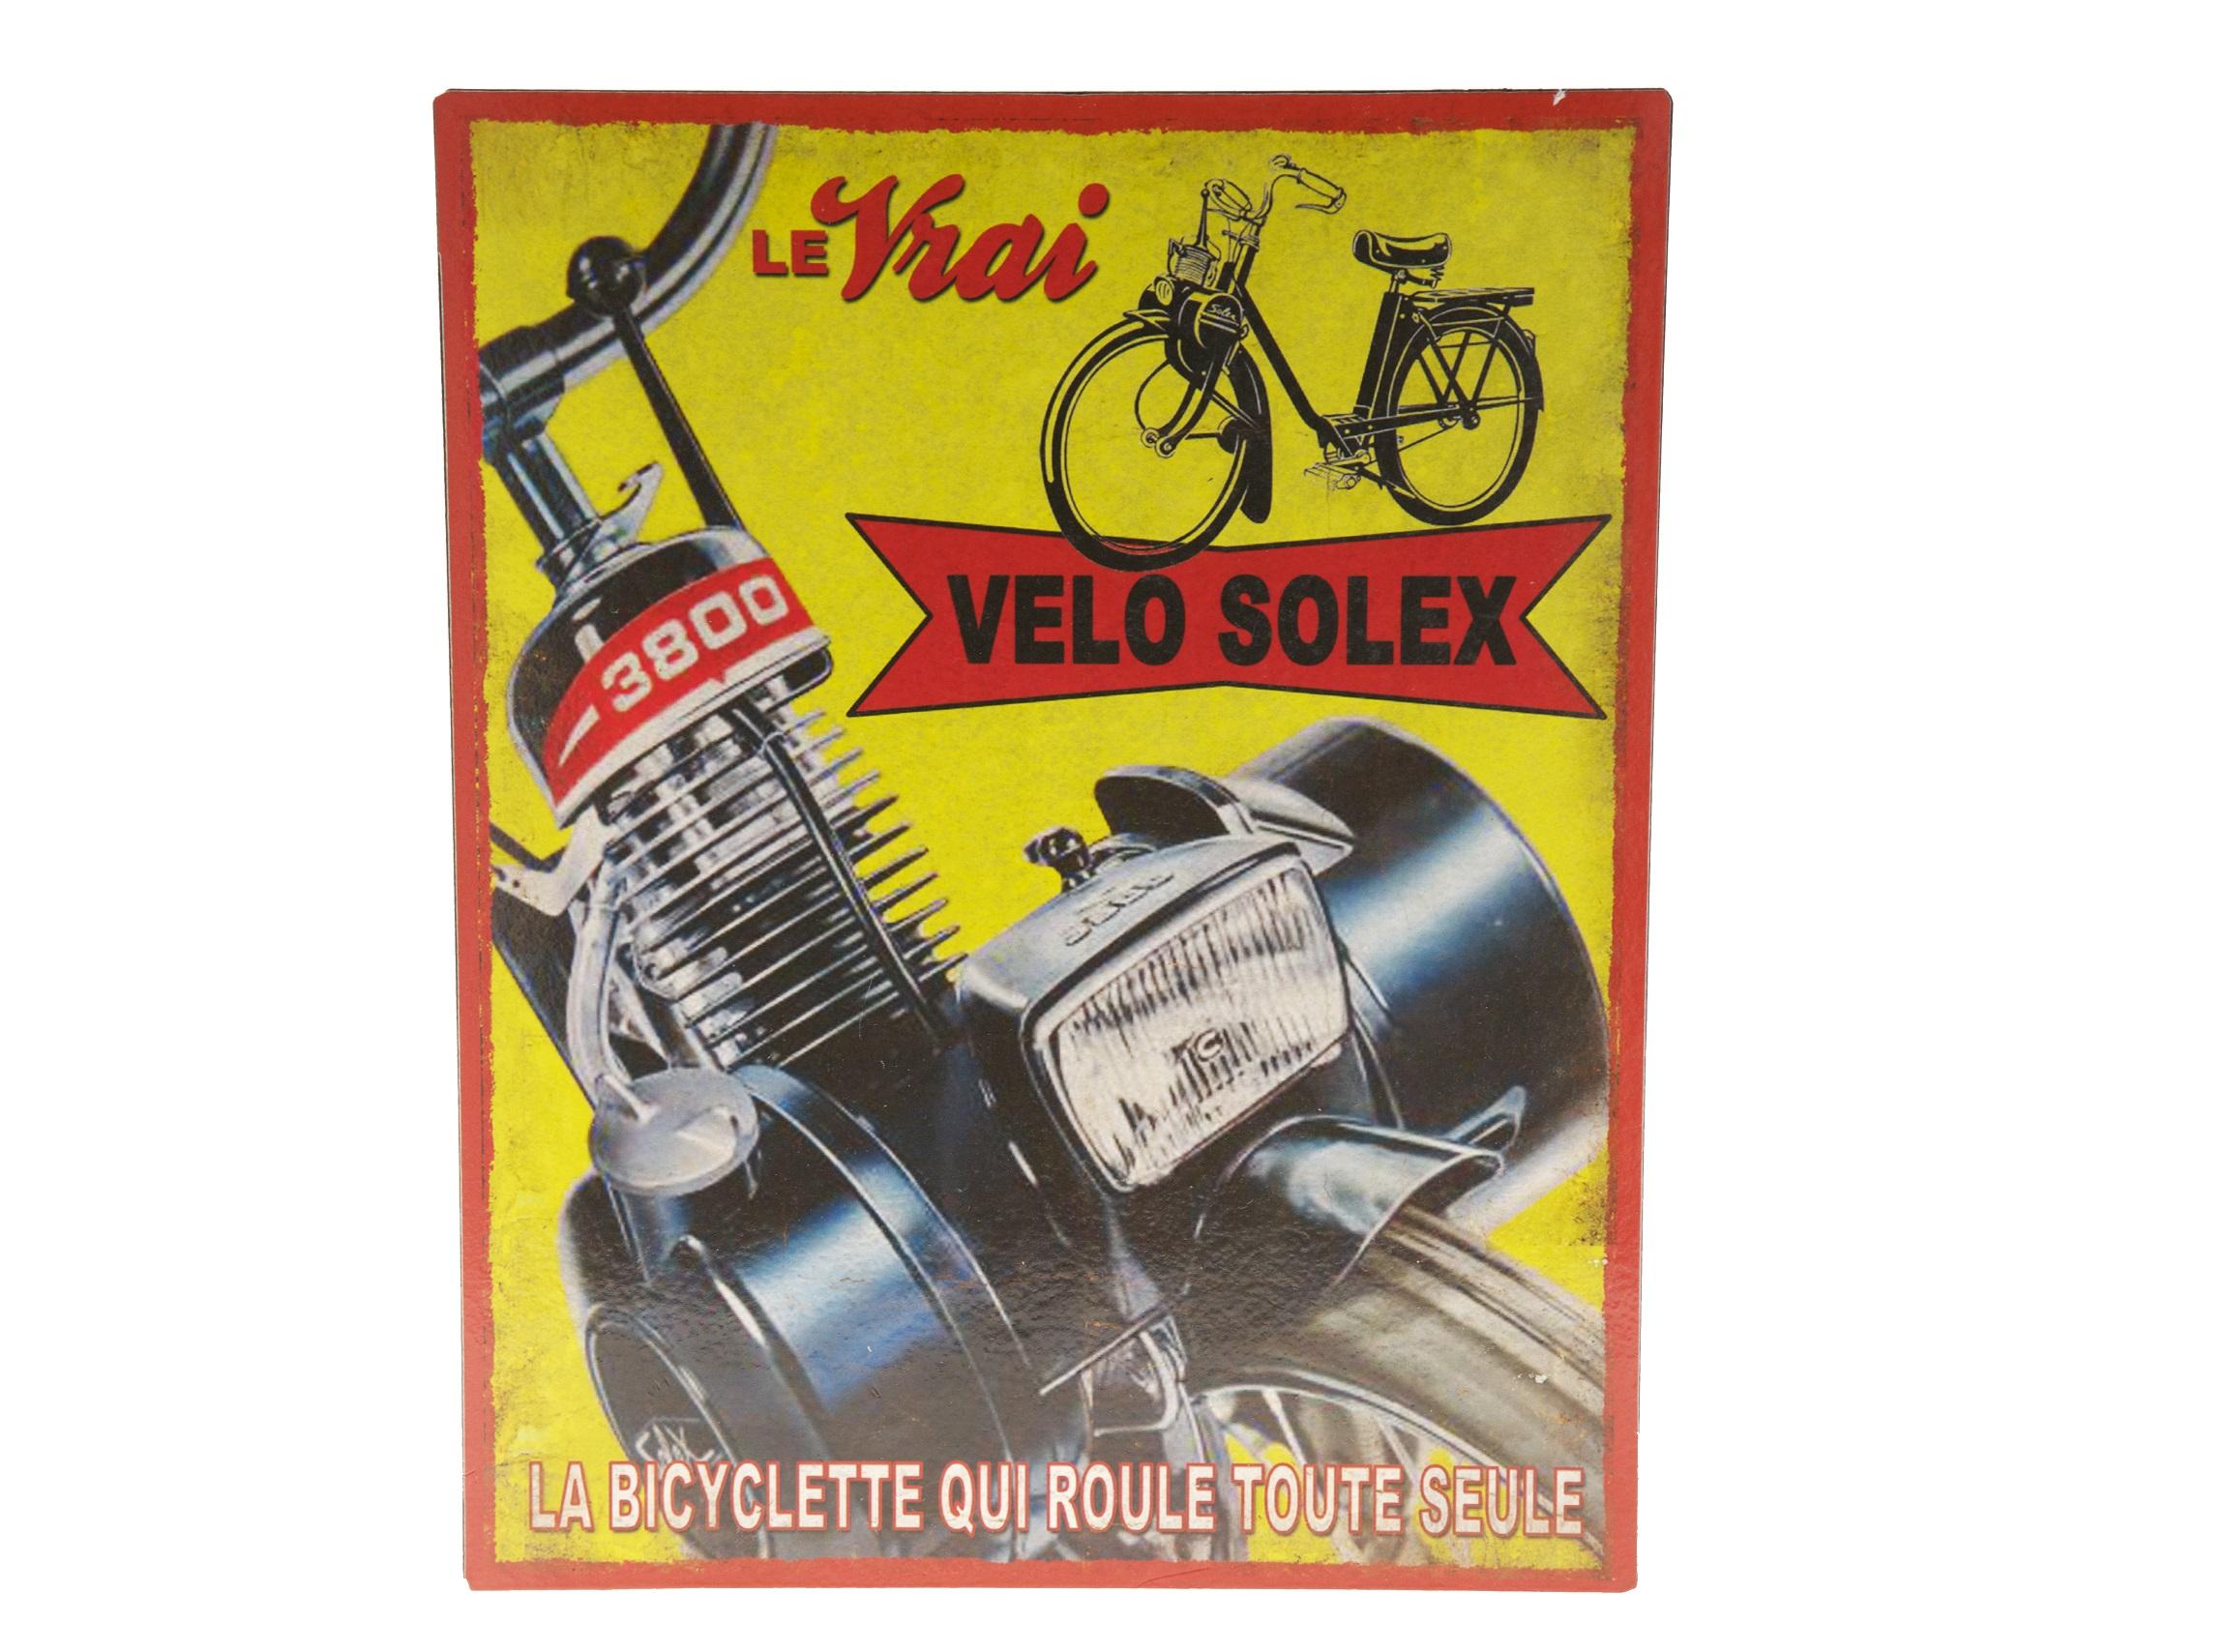 Табличка Le vrai veloДругое<br><br><br>Material: Металл<br>Length см: None<br>Width см: 24.2<br>Depth см: 3<br>Height см: 30.8